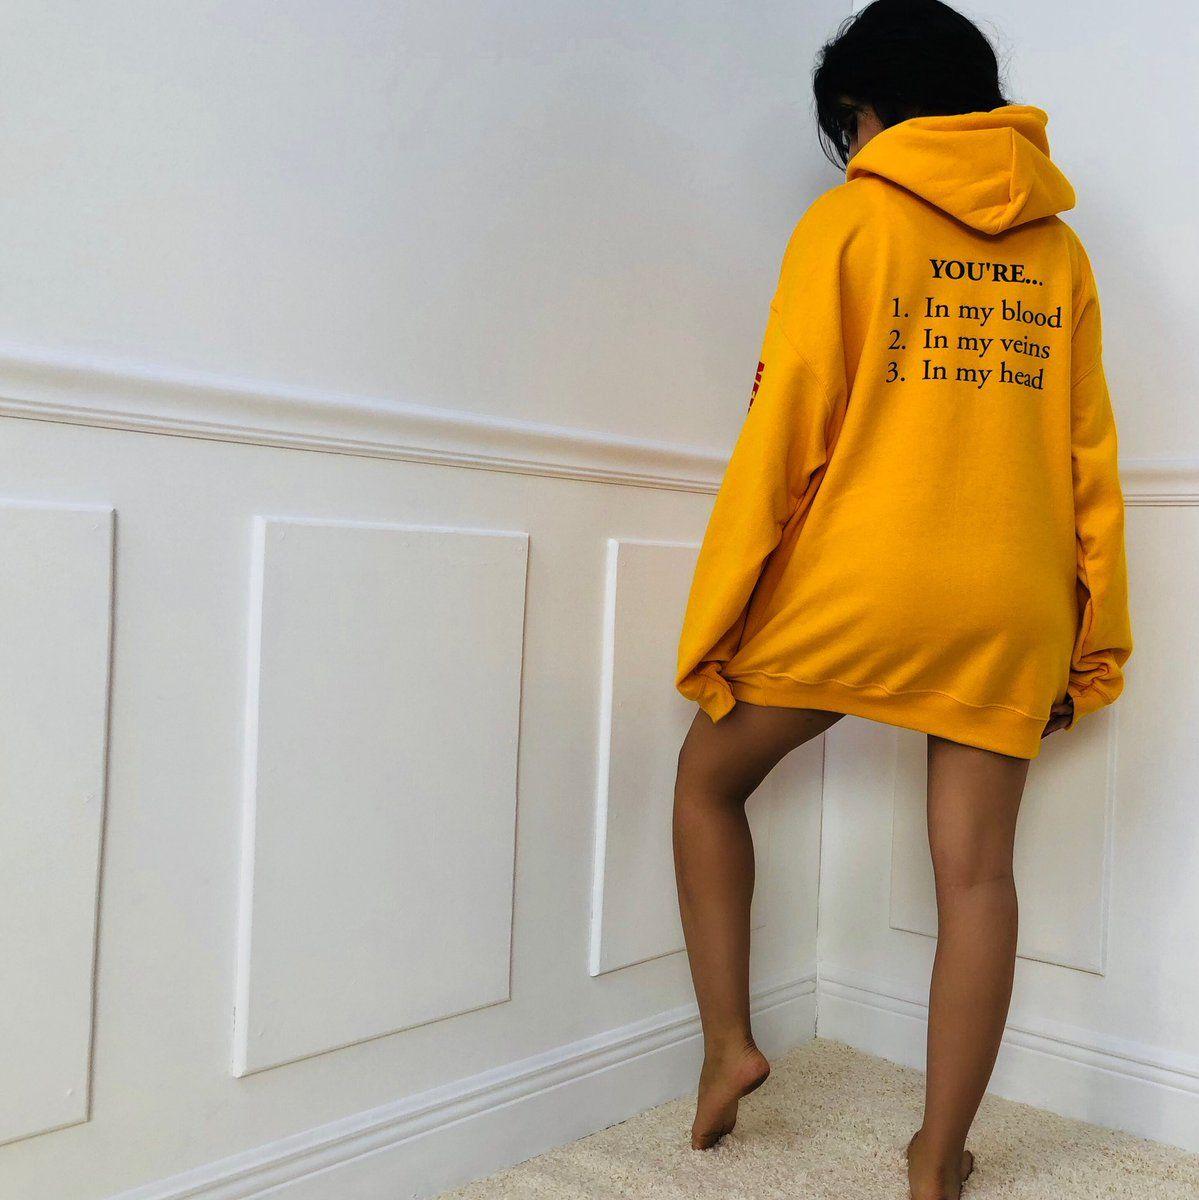 Buy Liar Hoodie Camila Cabello Cheap Online